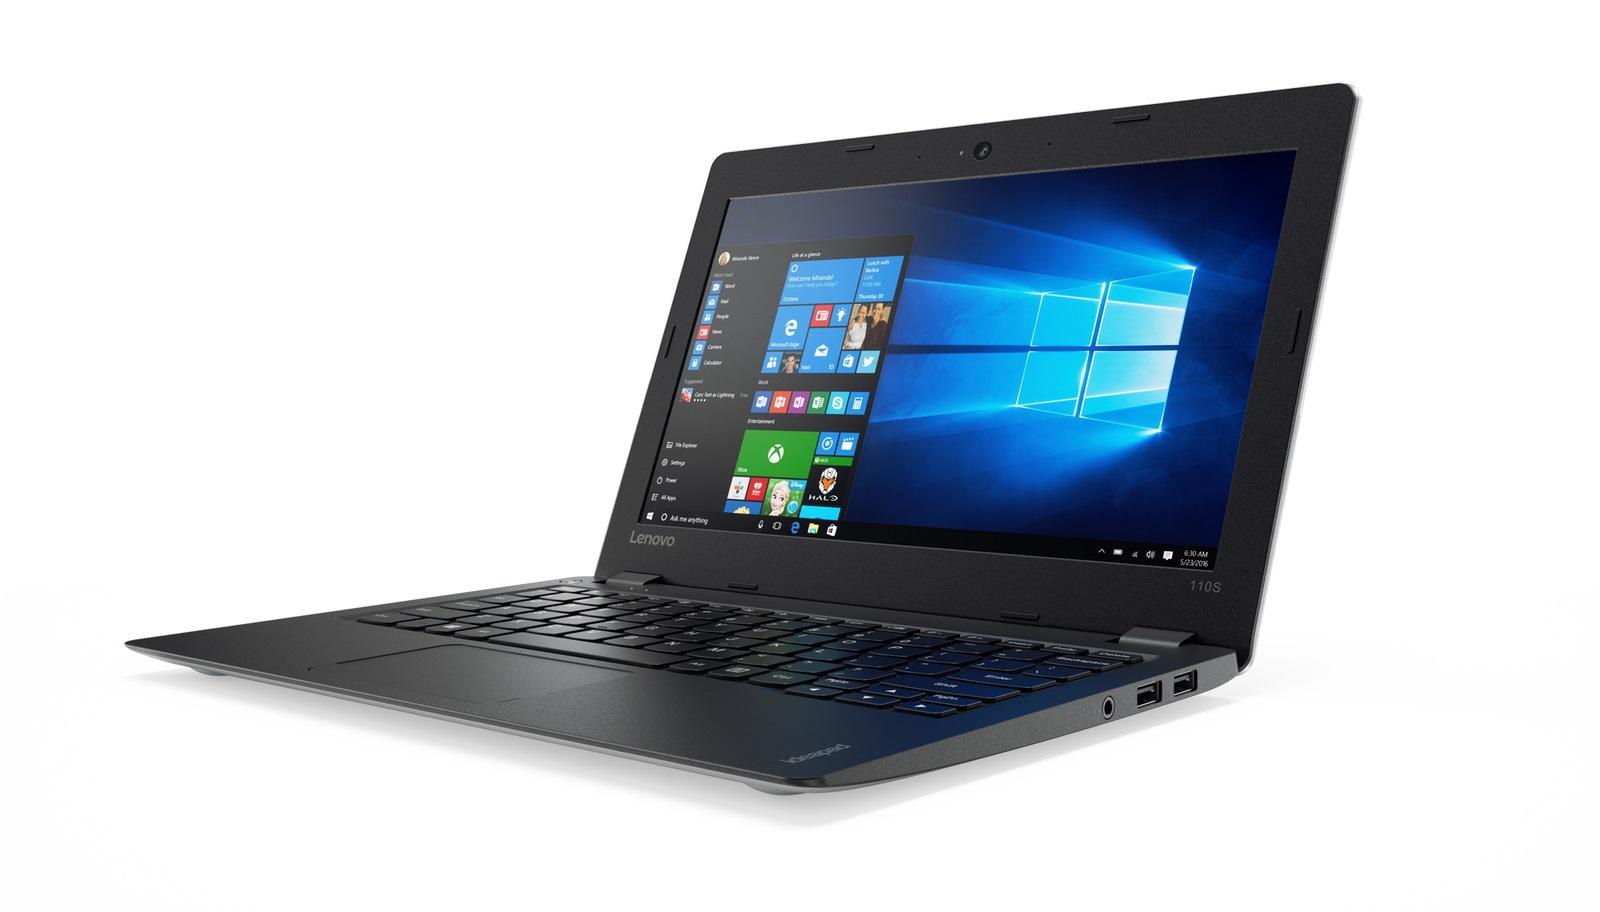 "Lenovo IdeaPad 110S-11IBR Celeron N3060 2,48GHz/2GB/32GB eMMC/11,6"" HD/AG/WIN10 stříbrná 80WG008FCK"